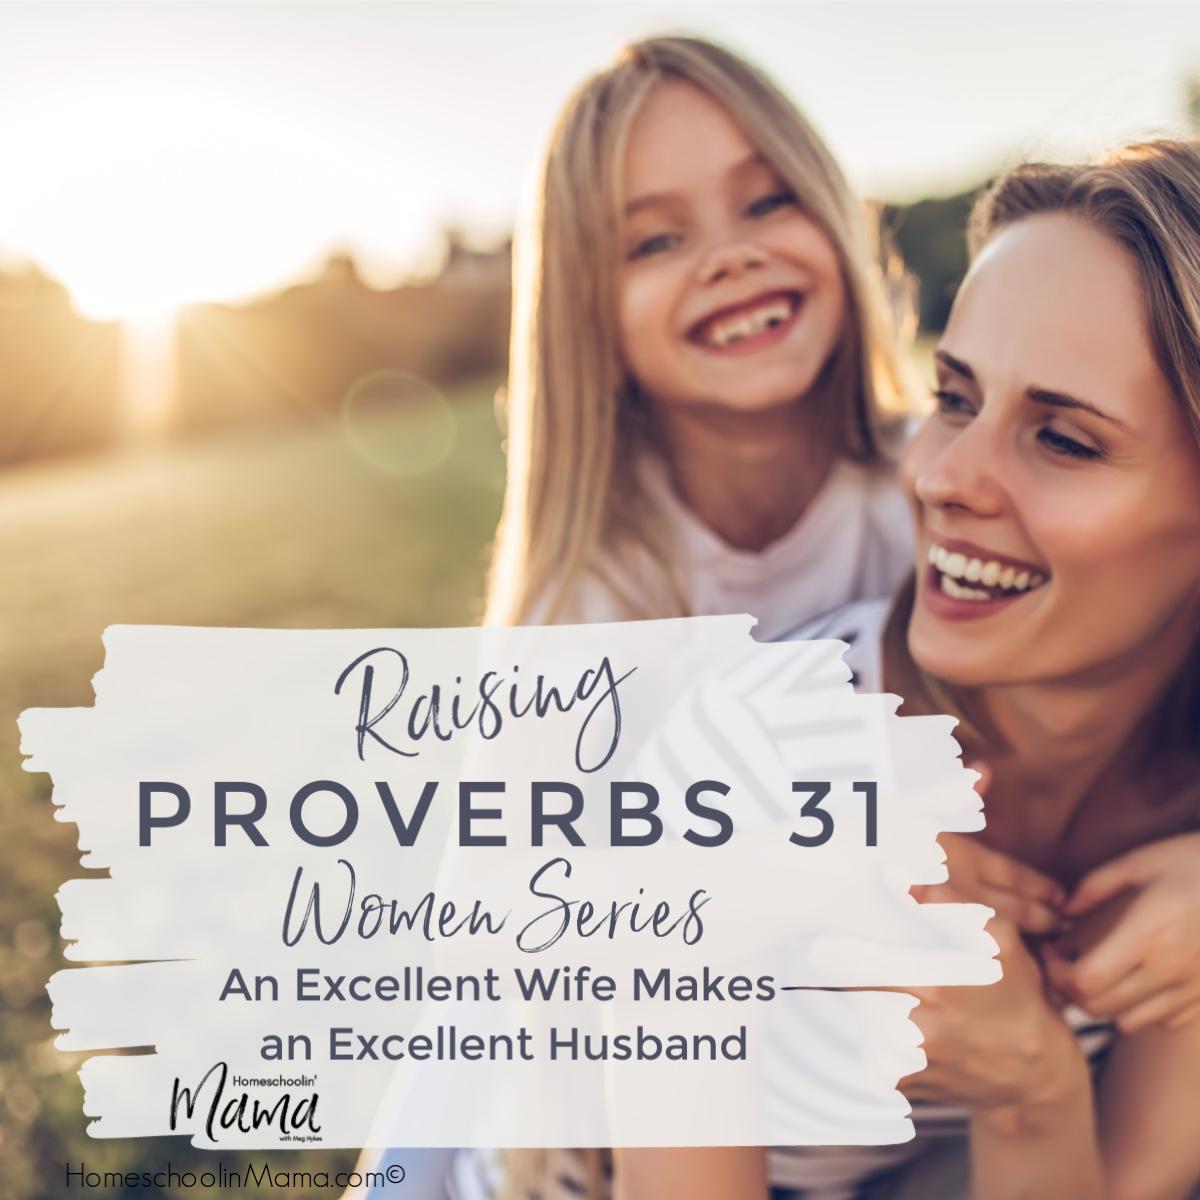 Raising Proverbs 31 Women An Excellent Wife Makes an Excellent Husband